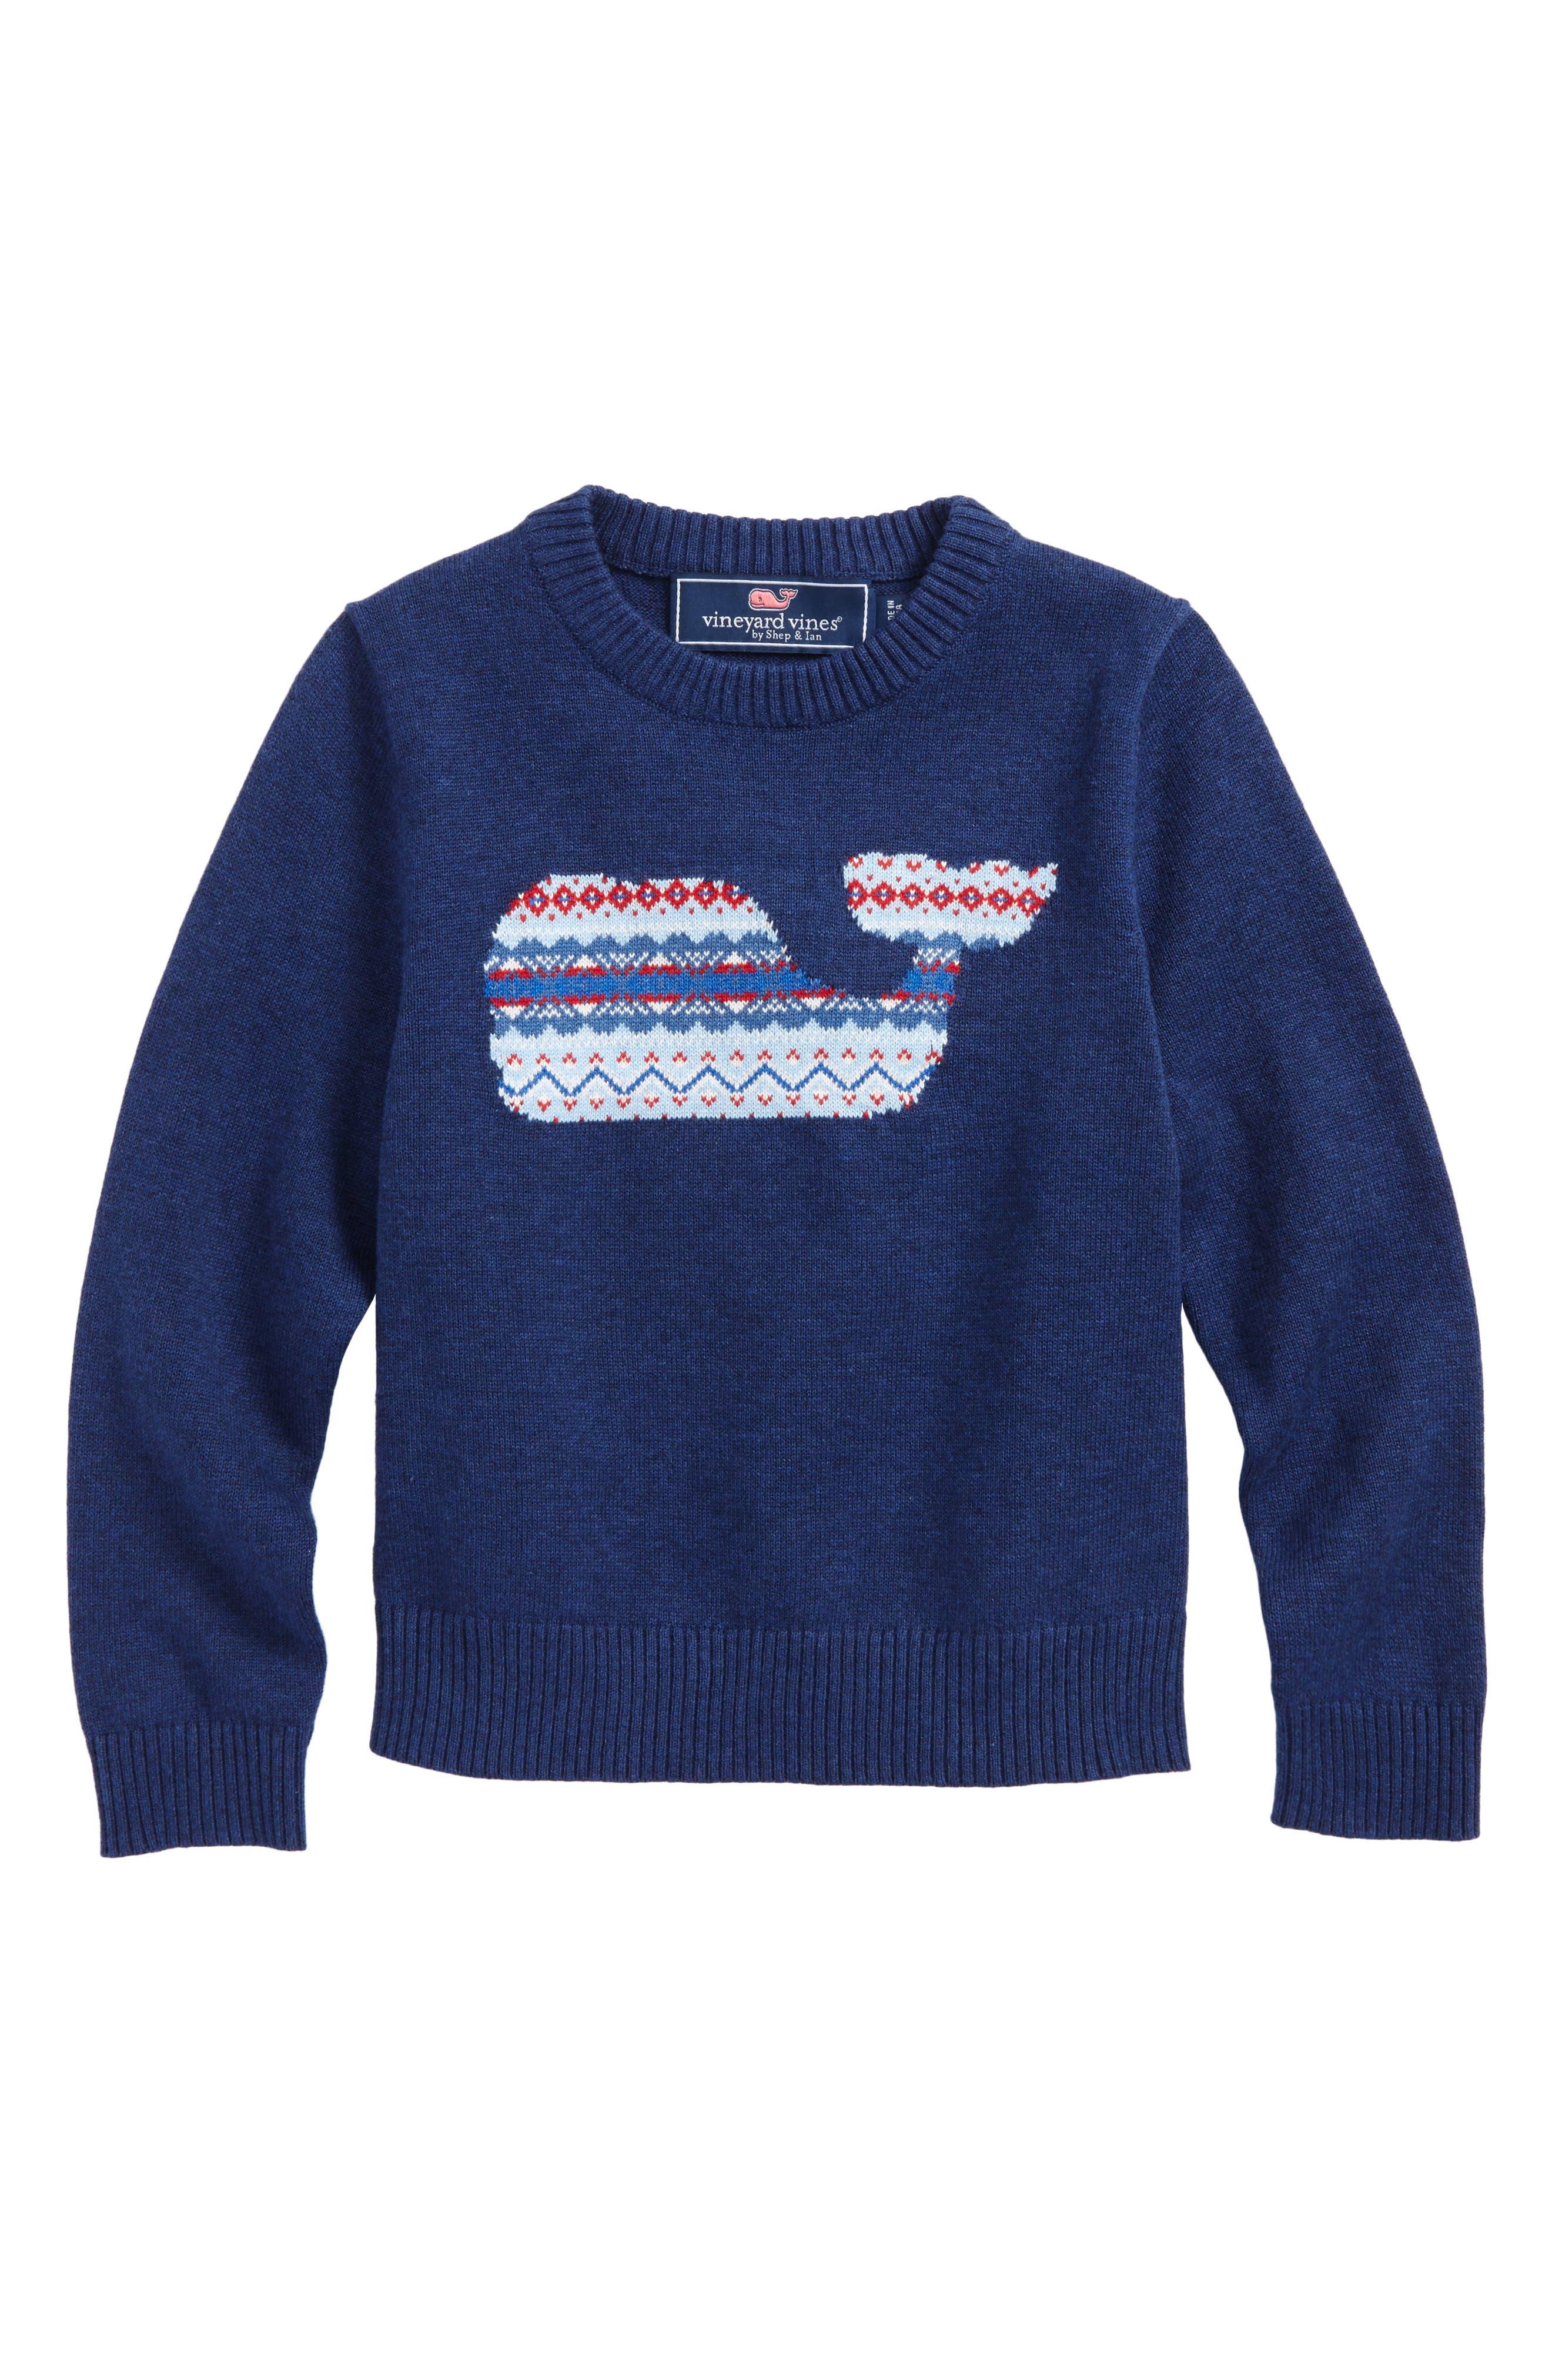 Main Image - vineyard vines Whale Isle Intarsia Sweater (Toddler Boys & Little Boys)